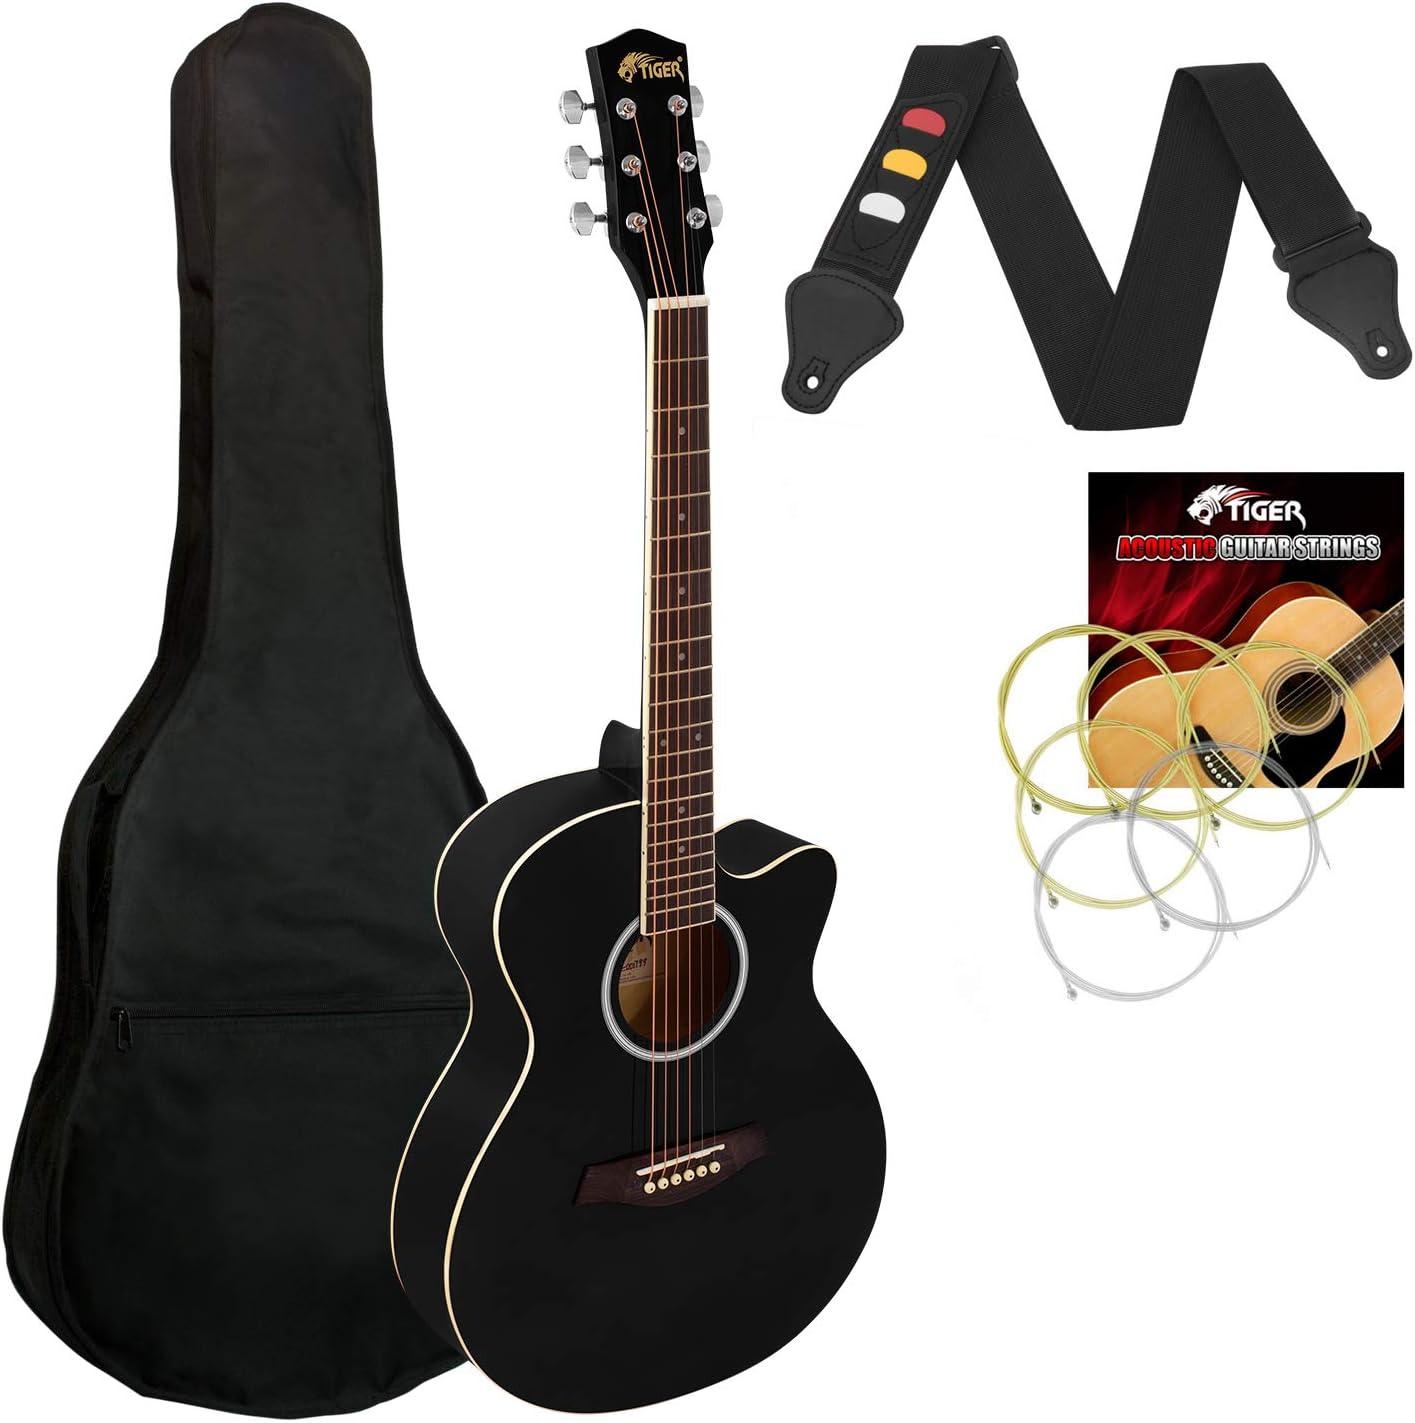 Tigre Guitarra Acústica Cuerpo Pequeño para Guitarra Principiante - Negro Completo